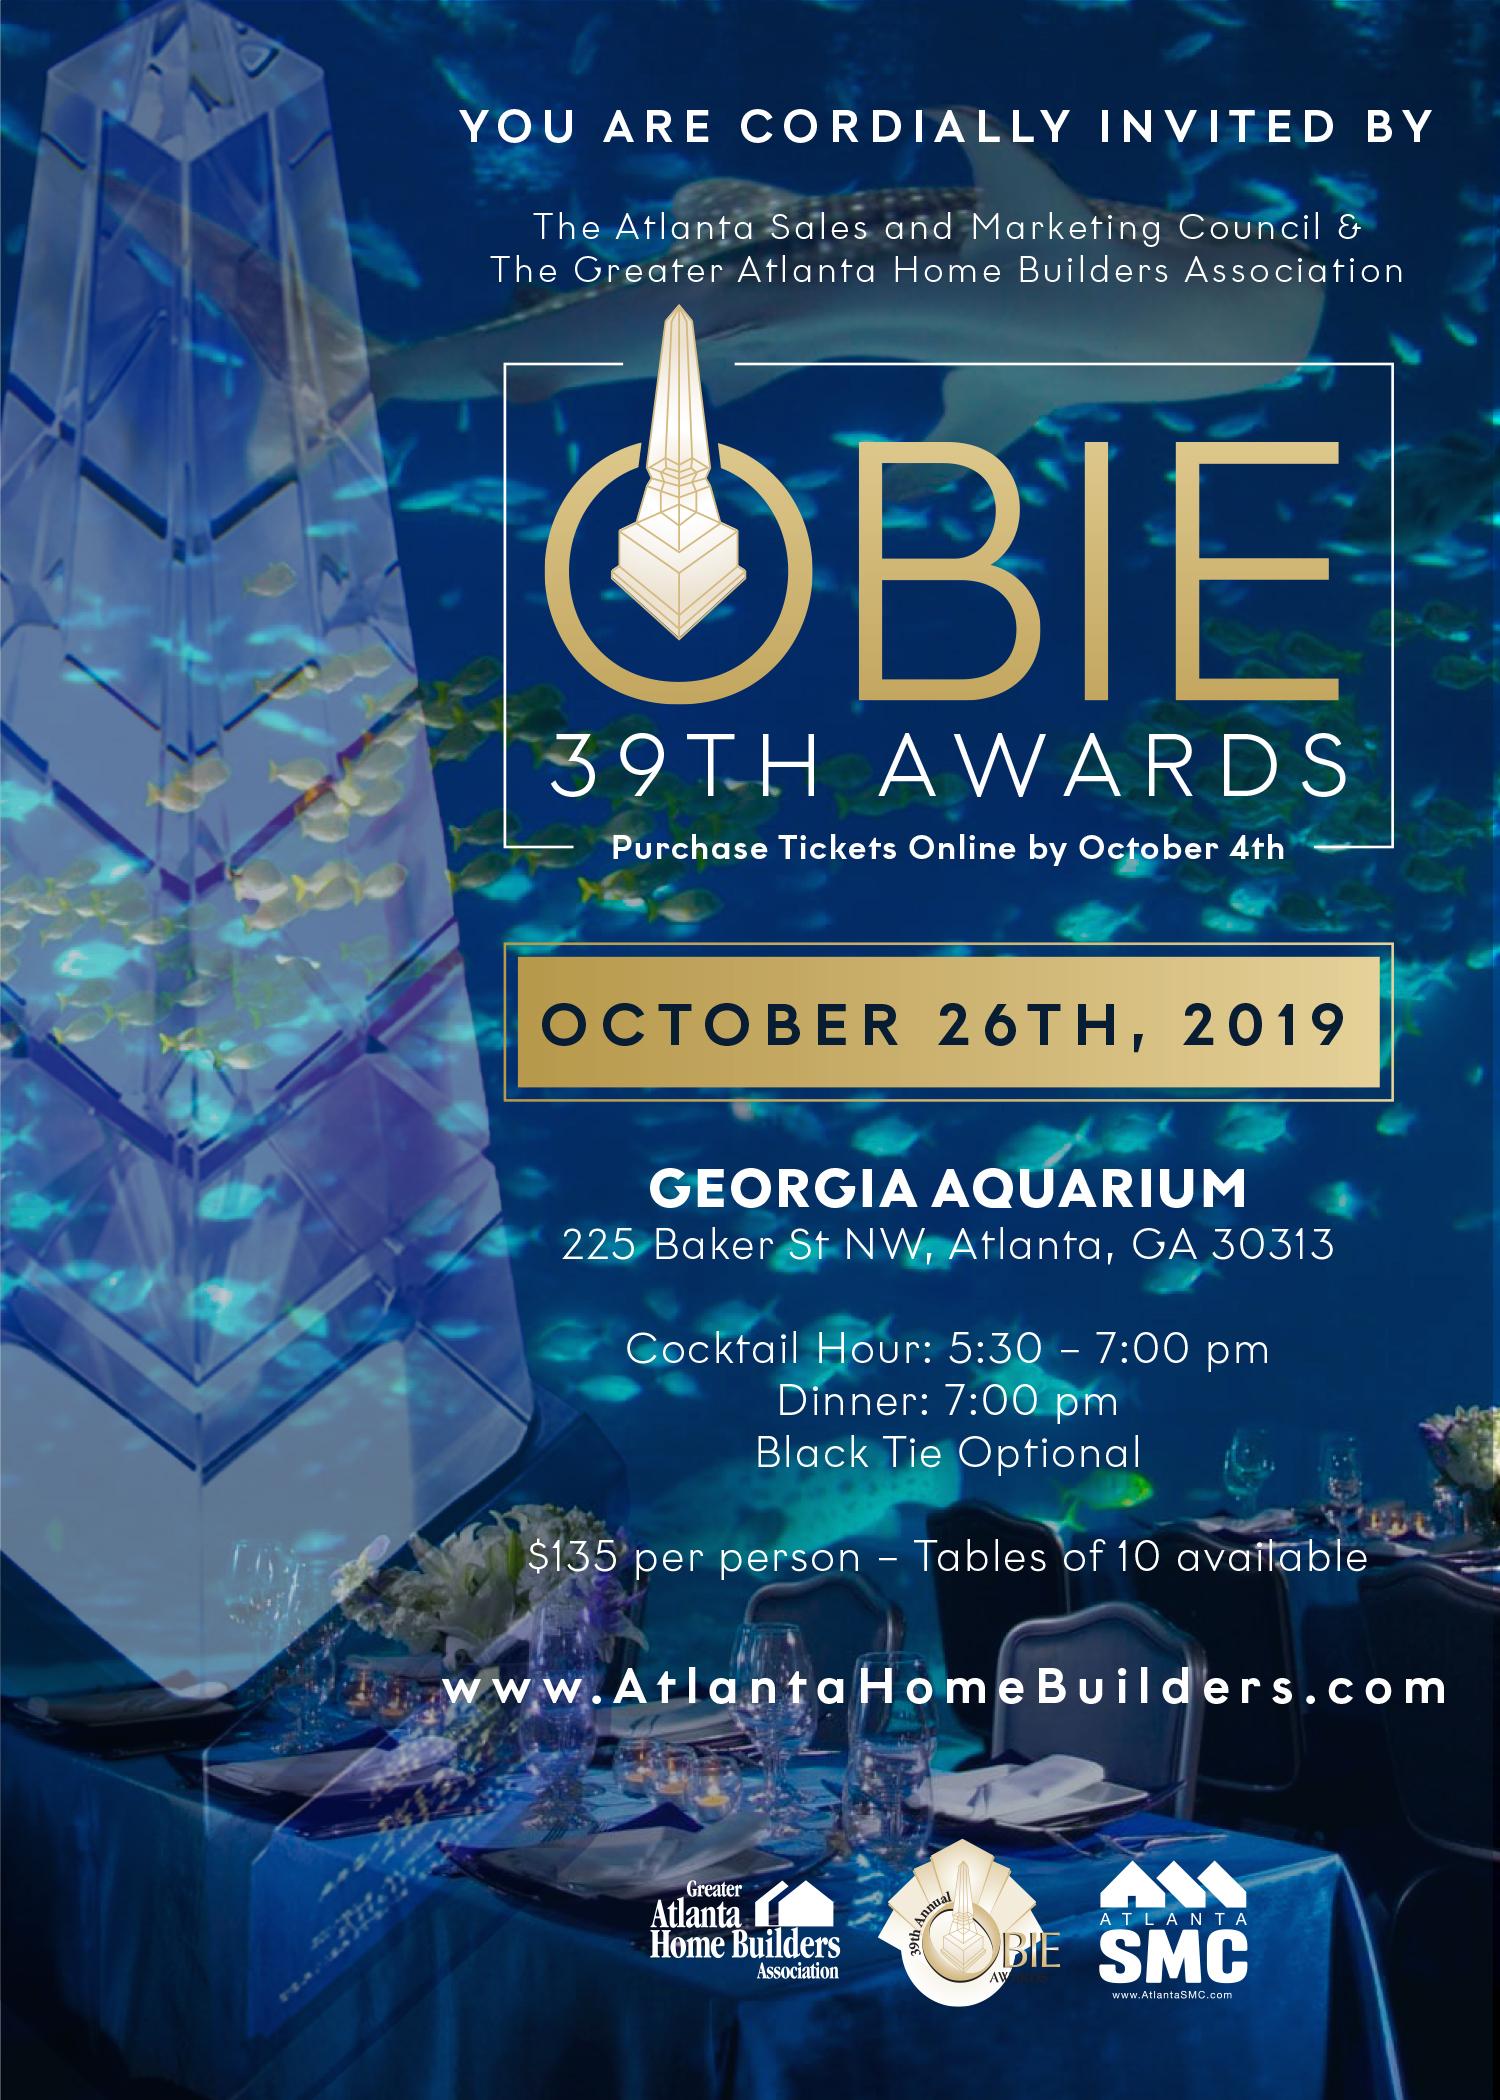 Tickets Now Selling for 39th Annual OBIE Awards at Georgia Aquarium